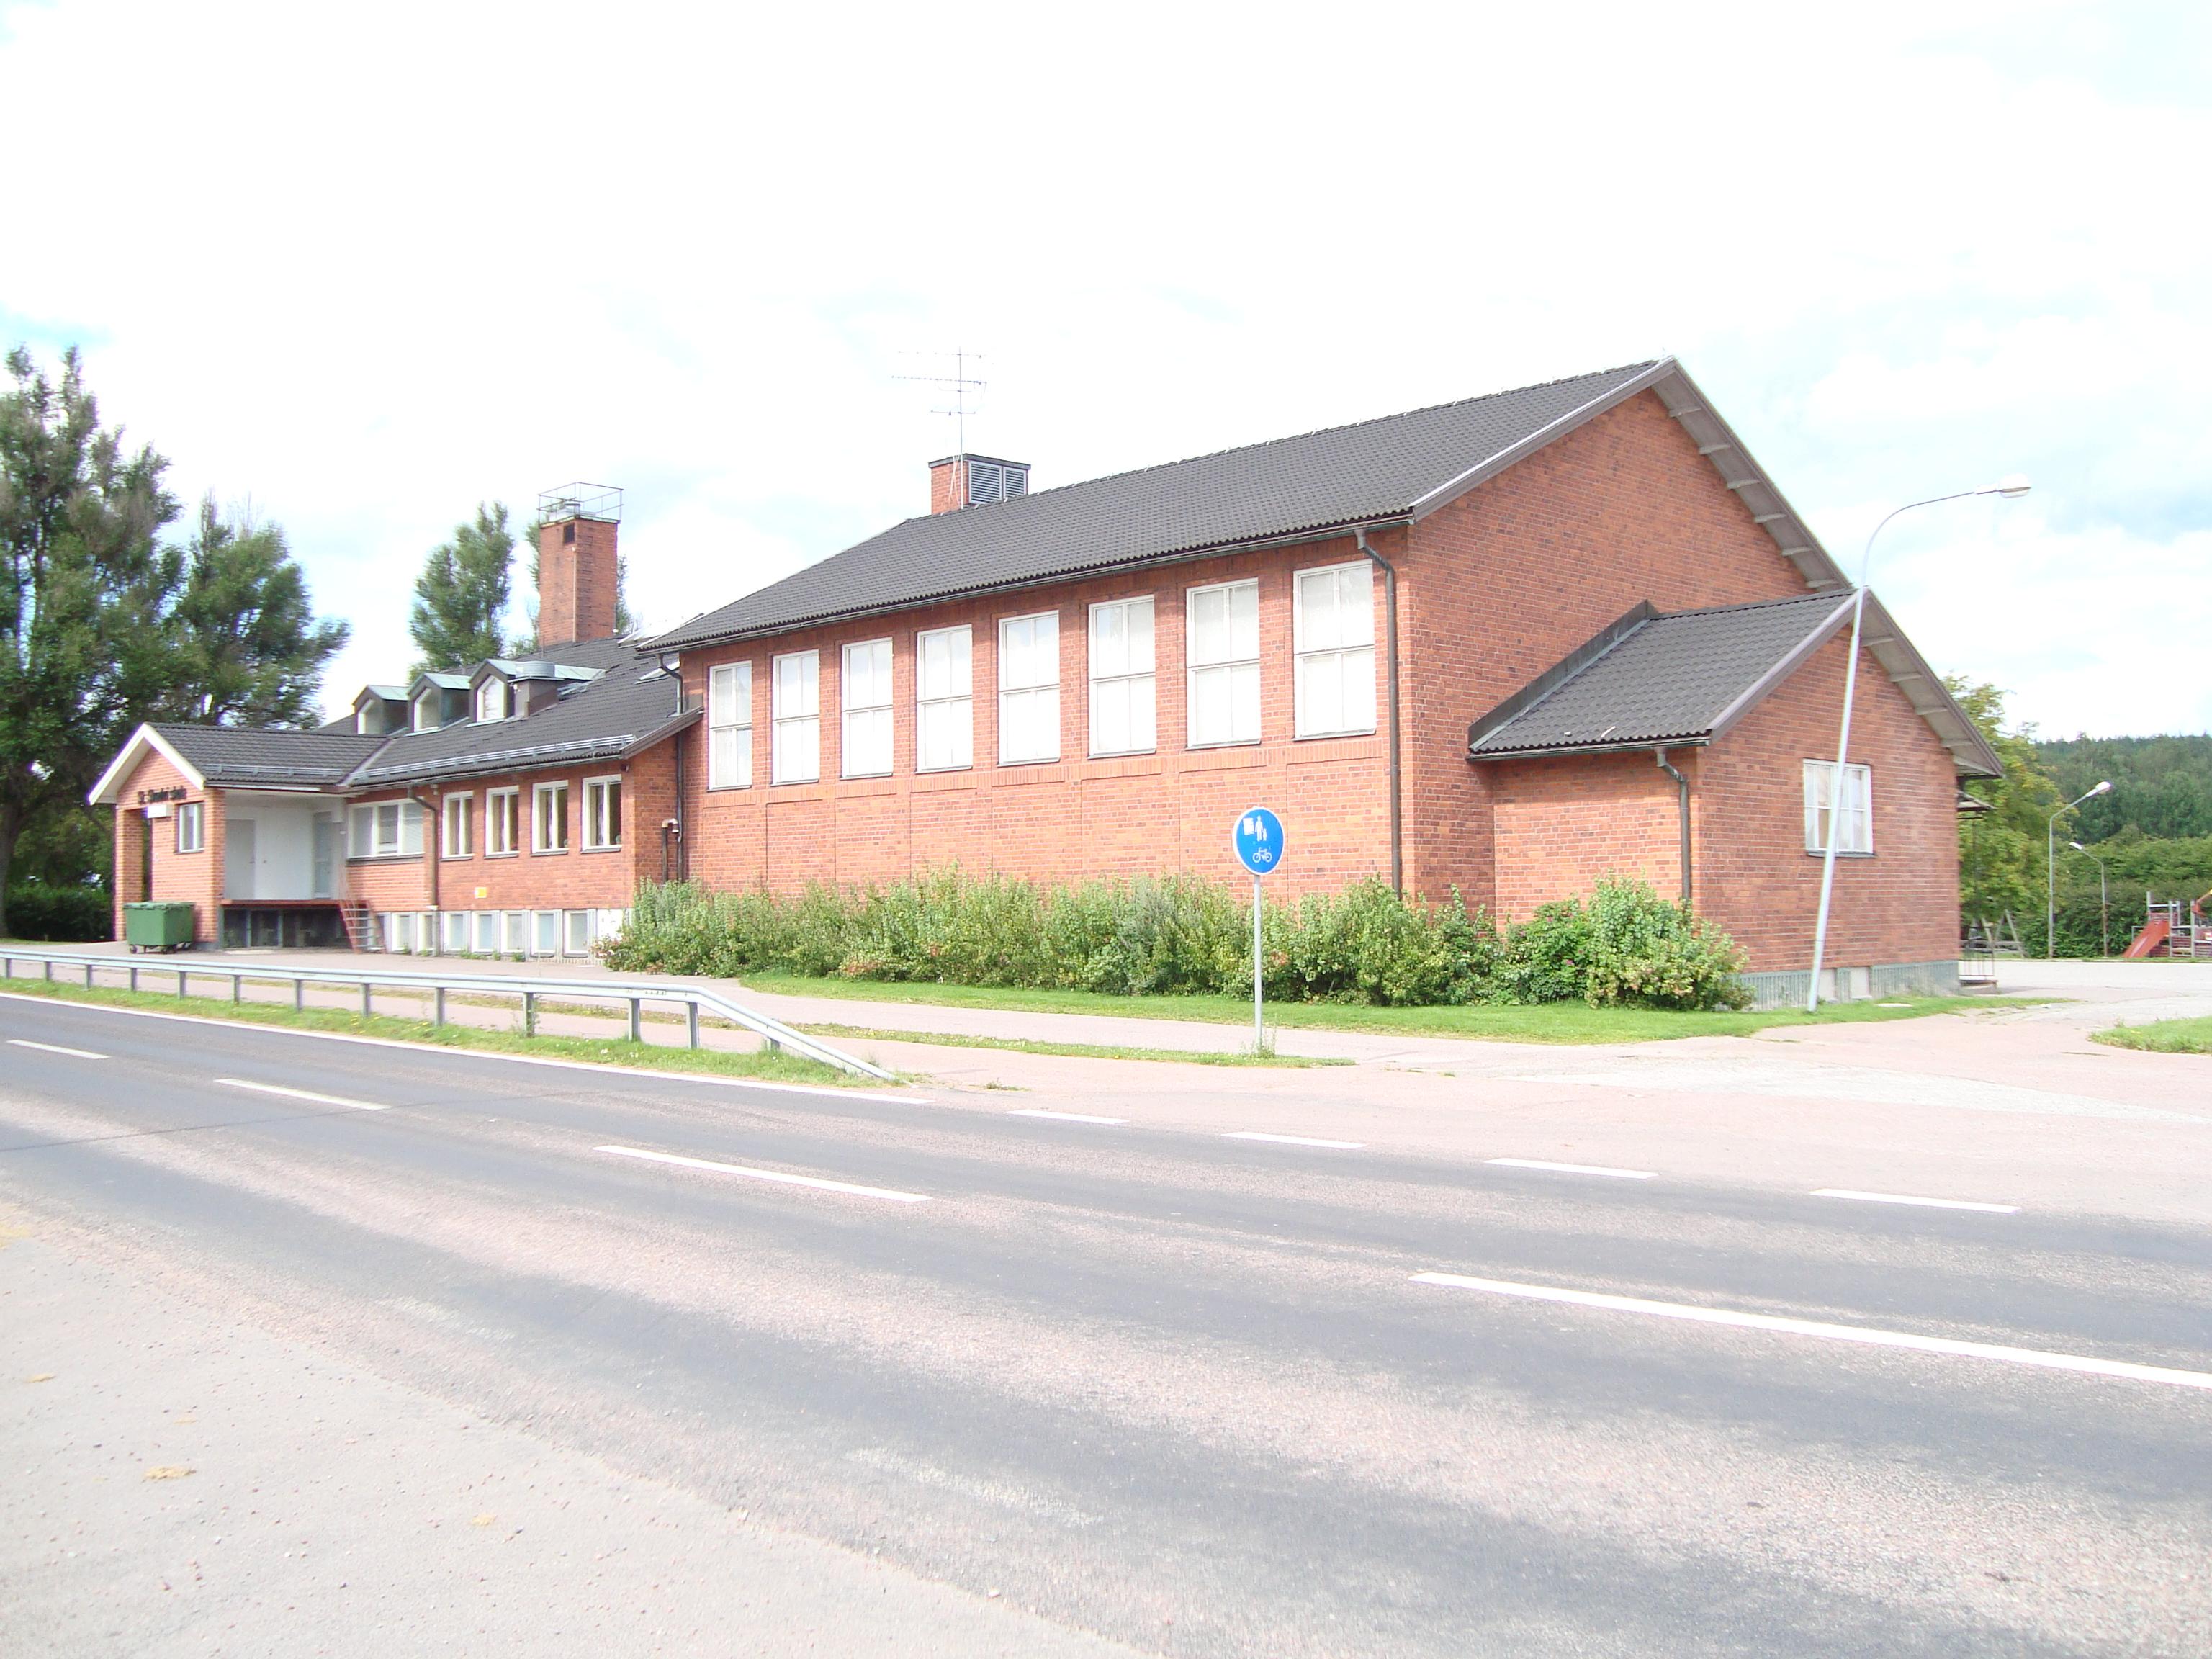 Stora Skedvi Hembygdsmuseum, Overview, Museums